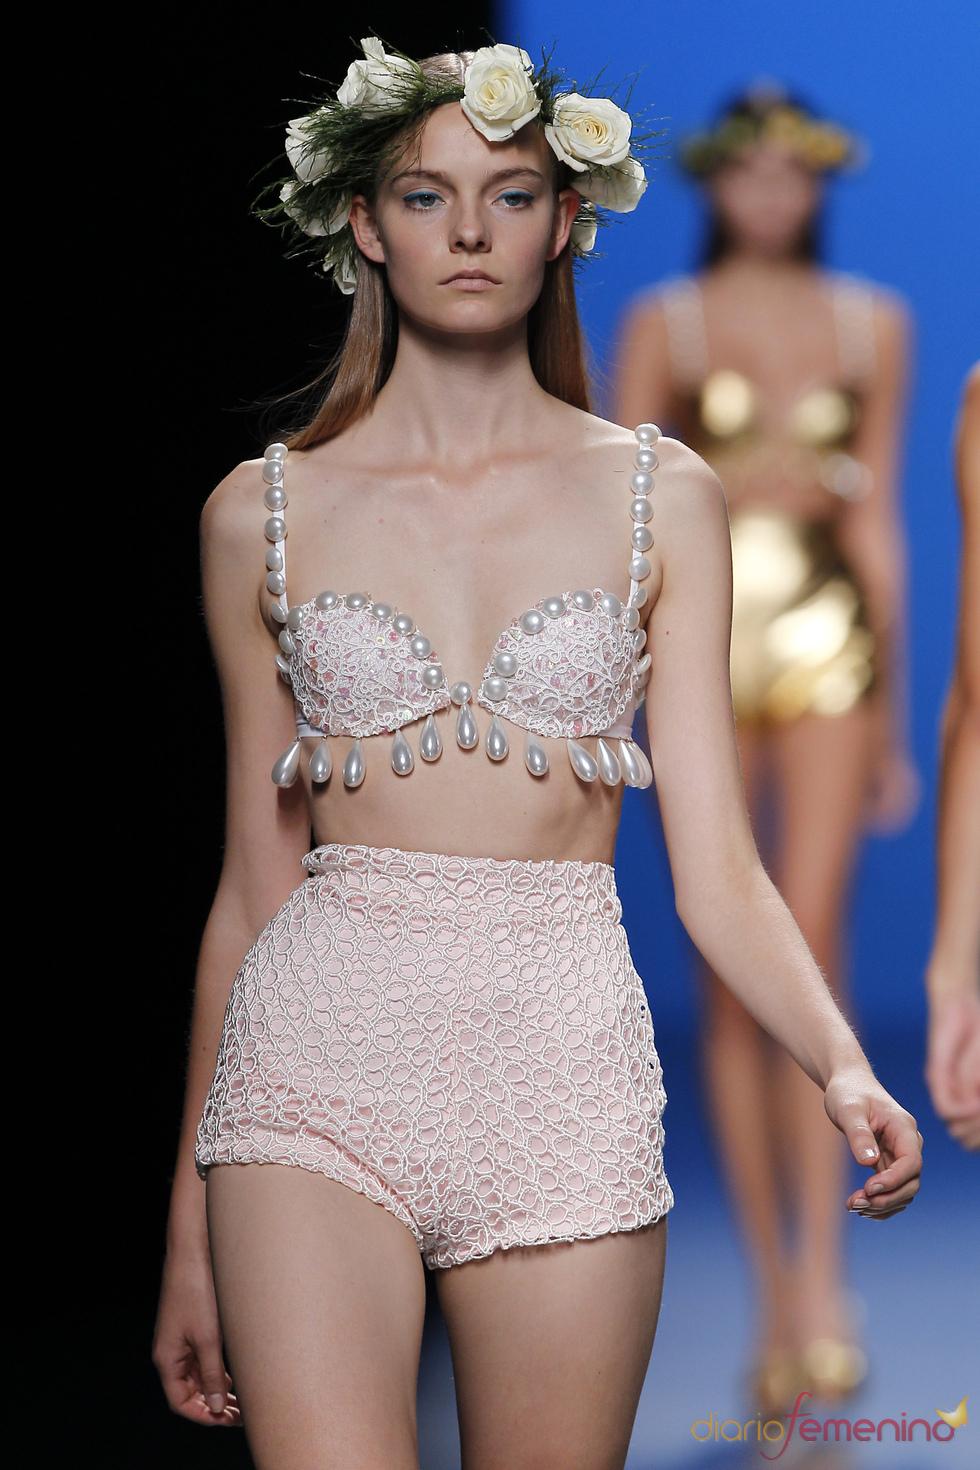 Bikini con encaje de María Escoté en la Madrid Fashion Week